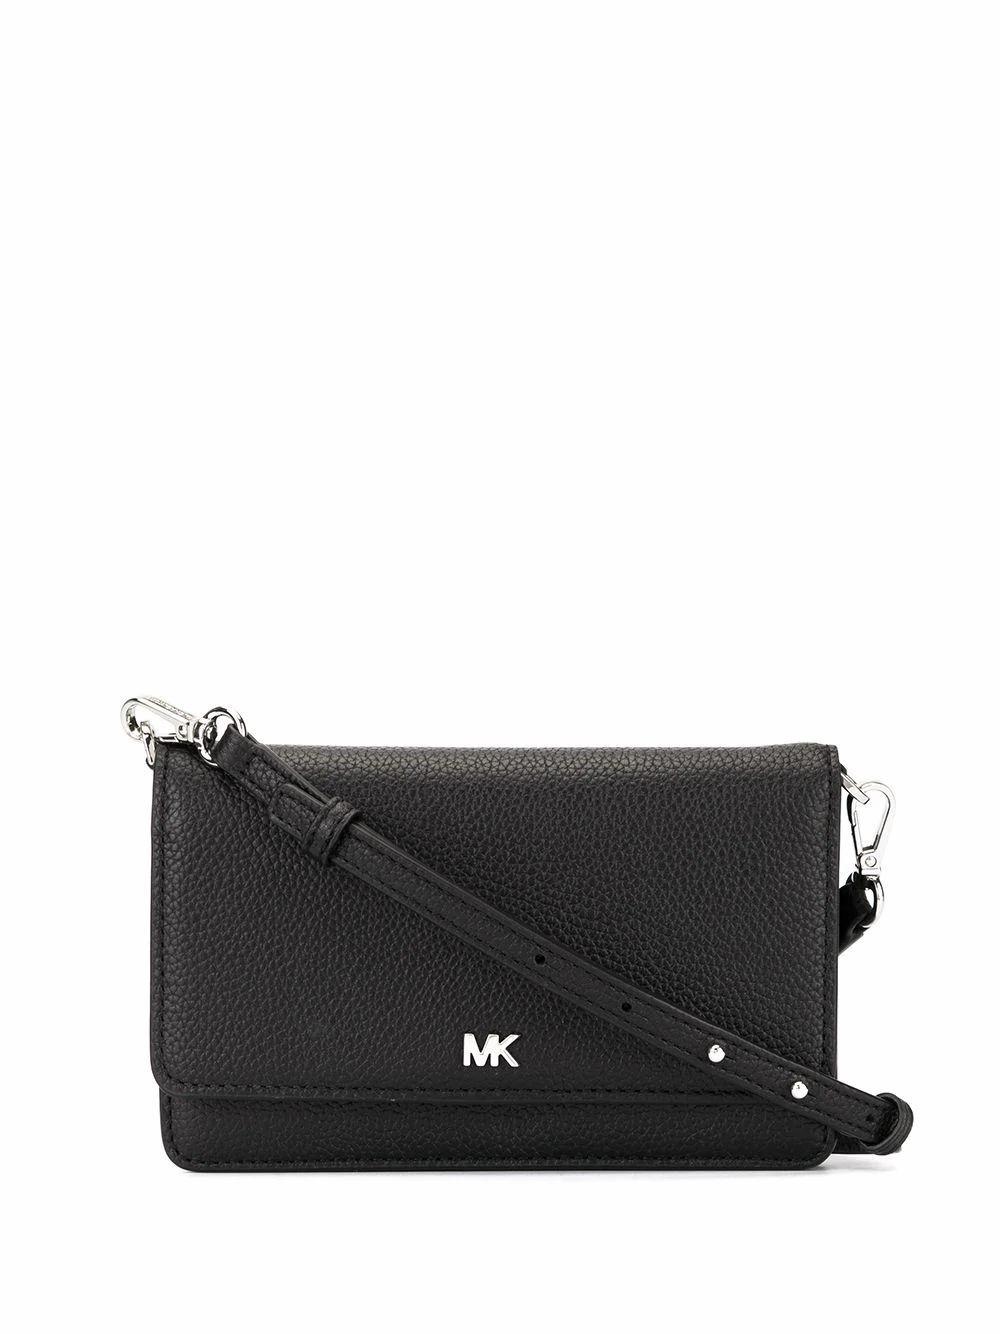 MICHAEL KORS WOMEN'S 32T8SF5C1L001 BLACK LEATHER SHOULDER BAG